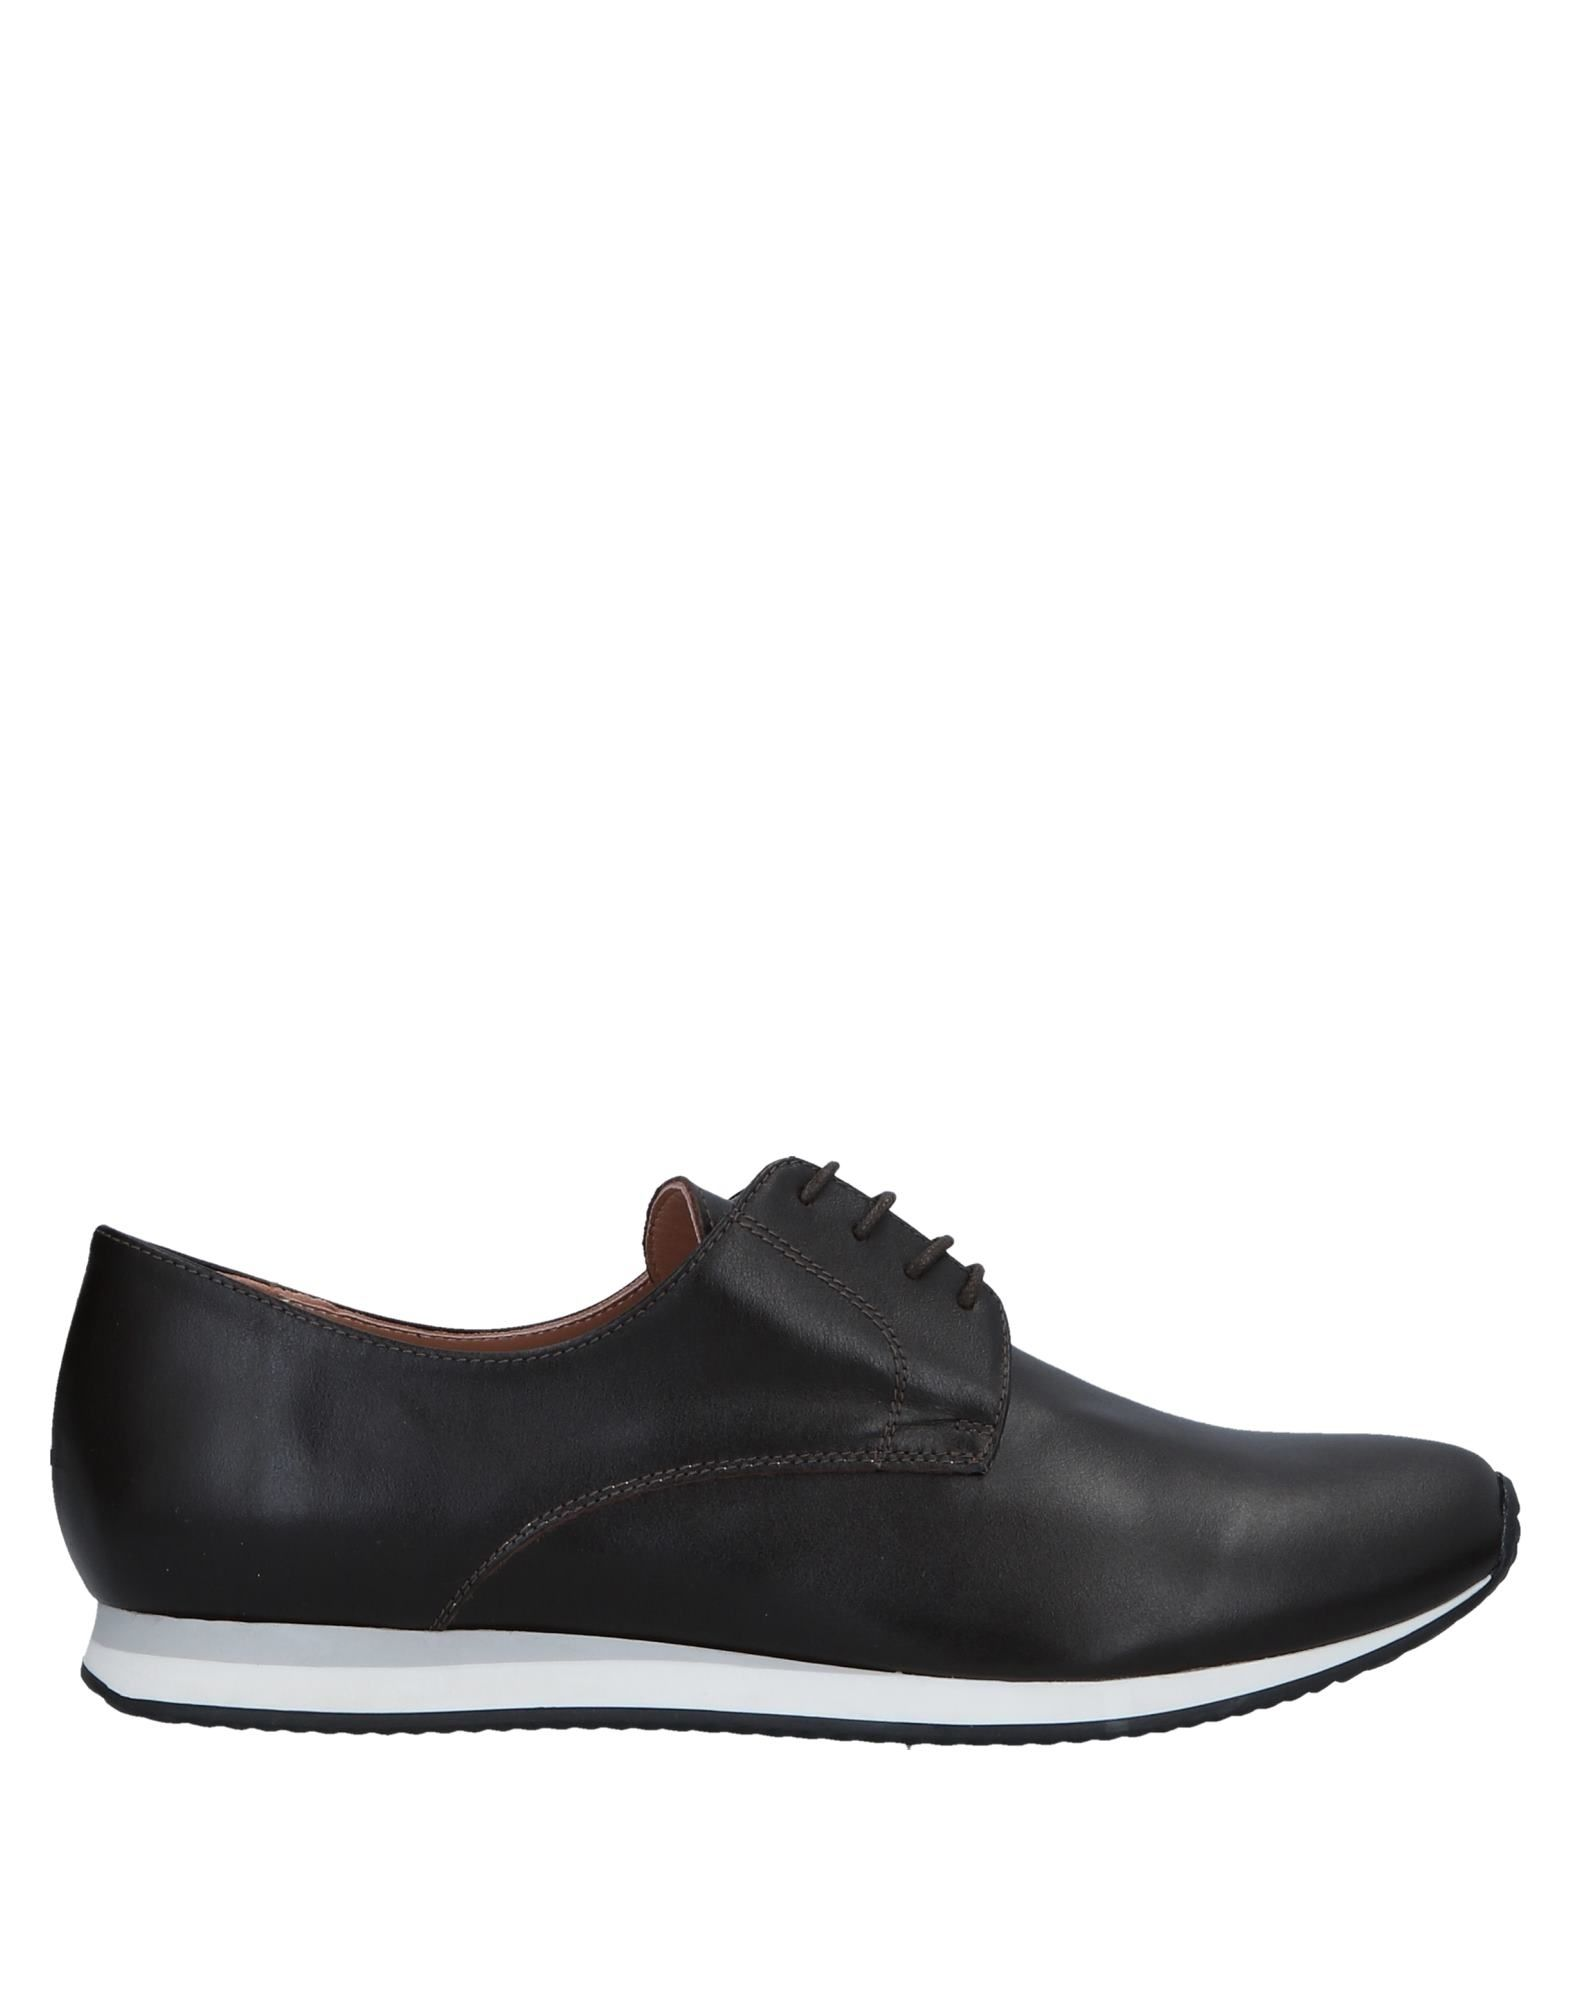 Settantatre Lr Schnürschuhe Damen  11515379ND Neue Schuhe